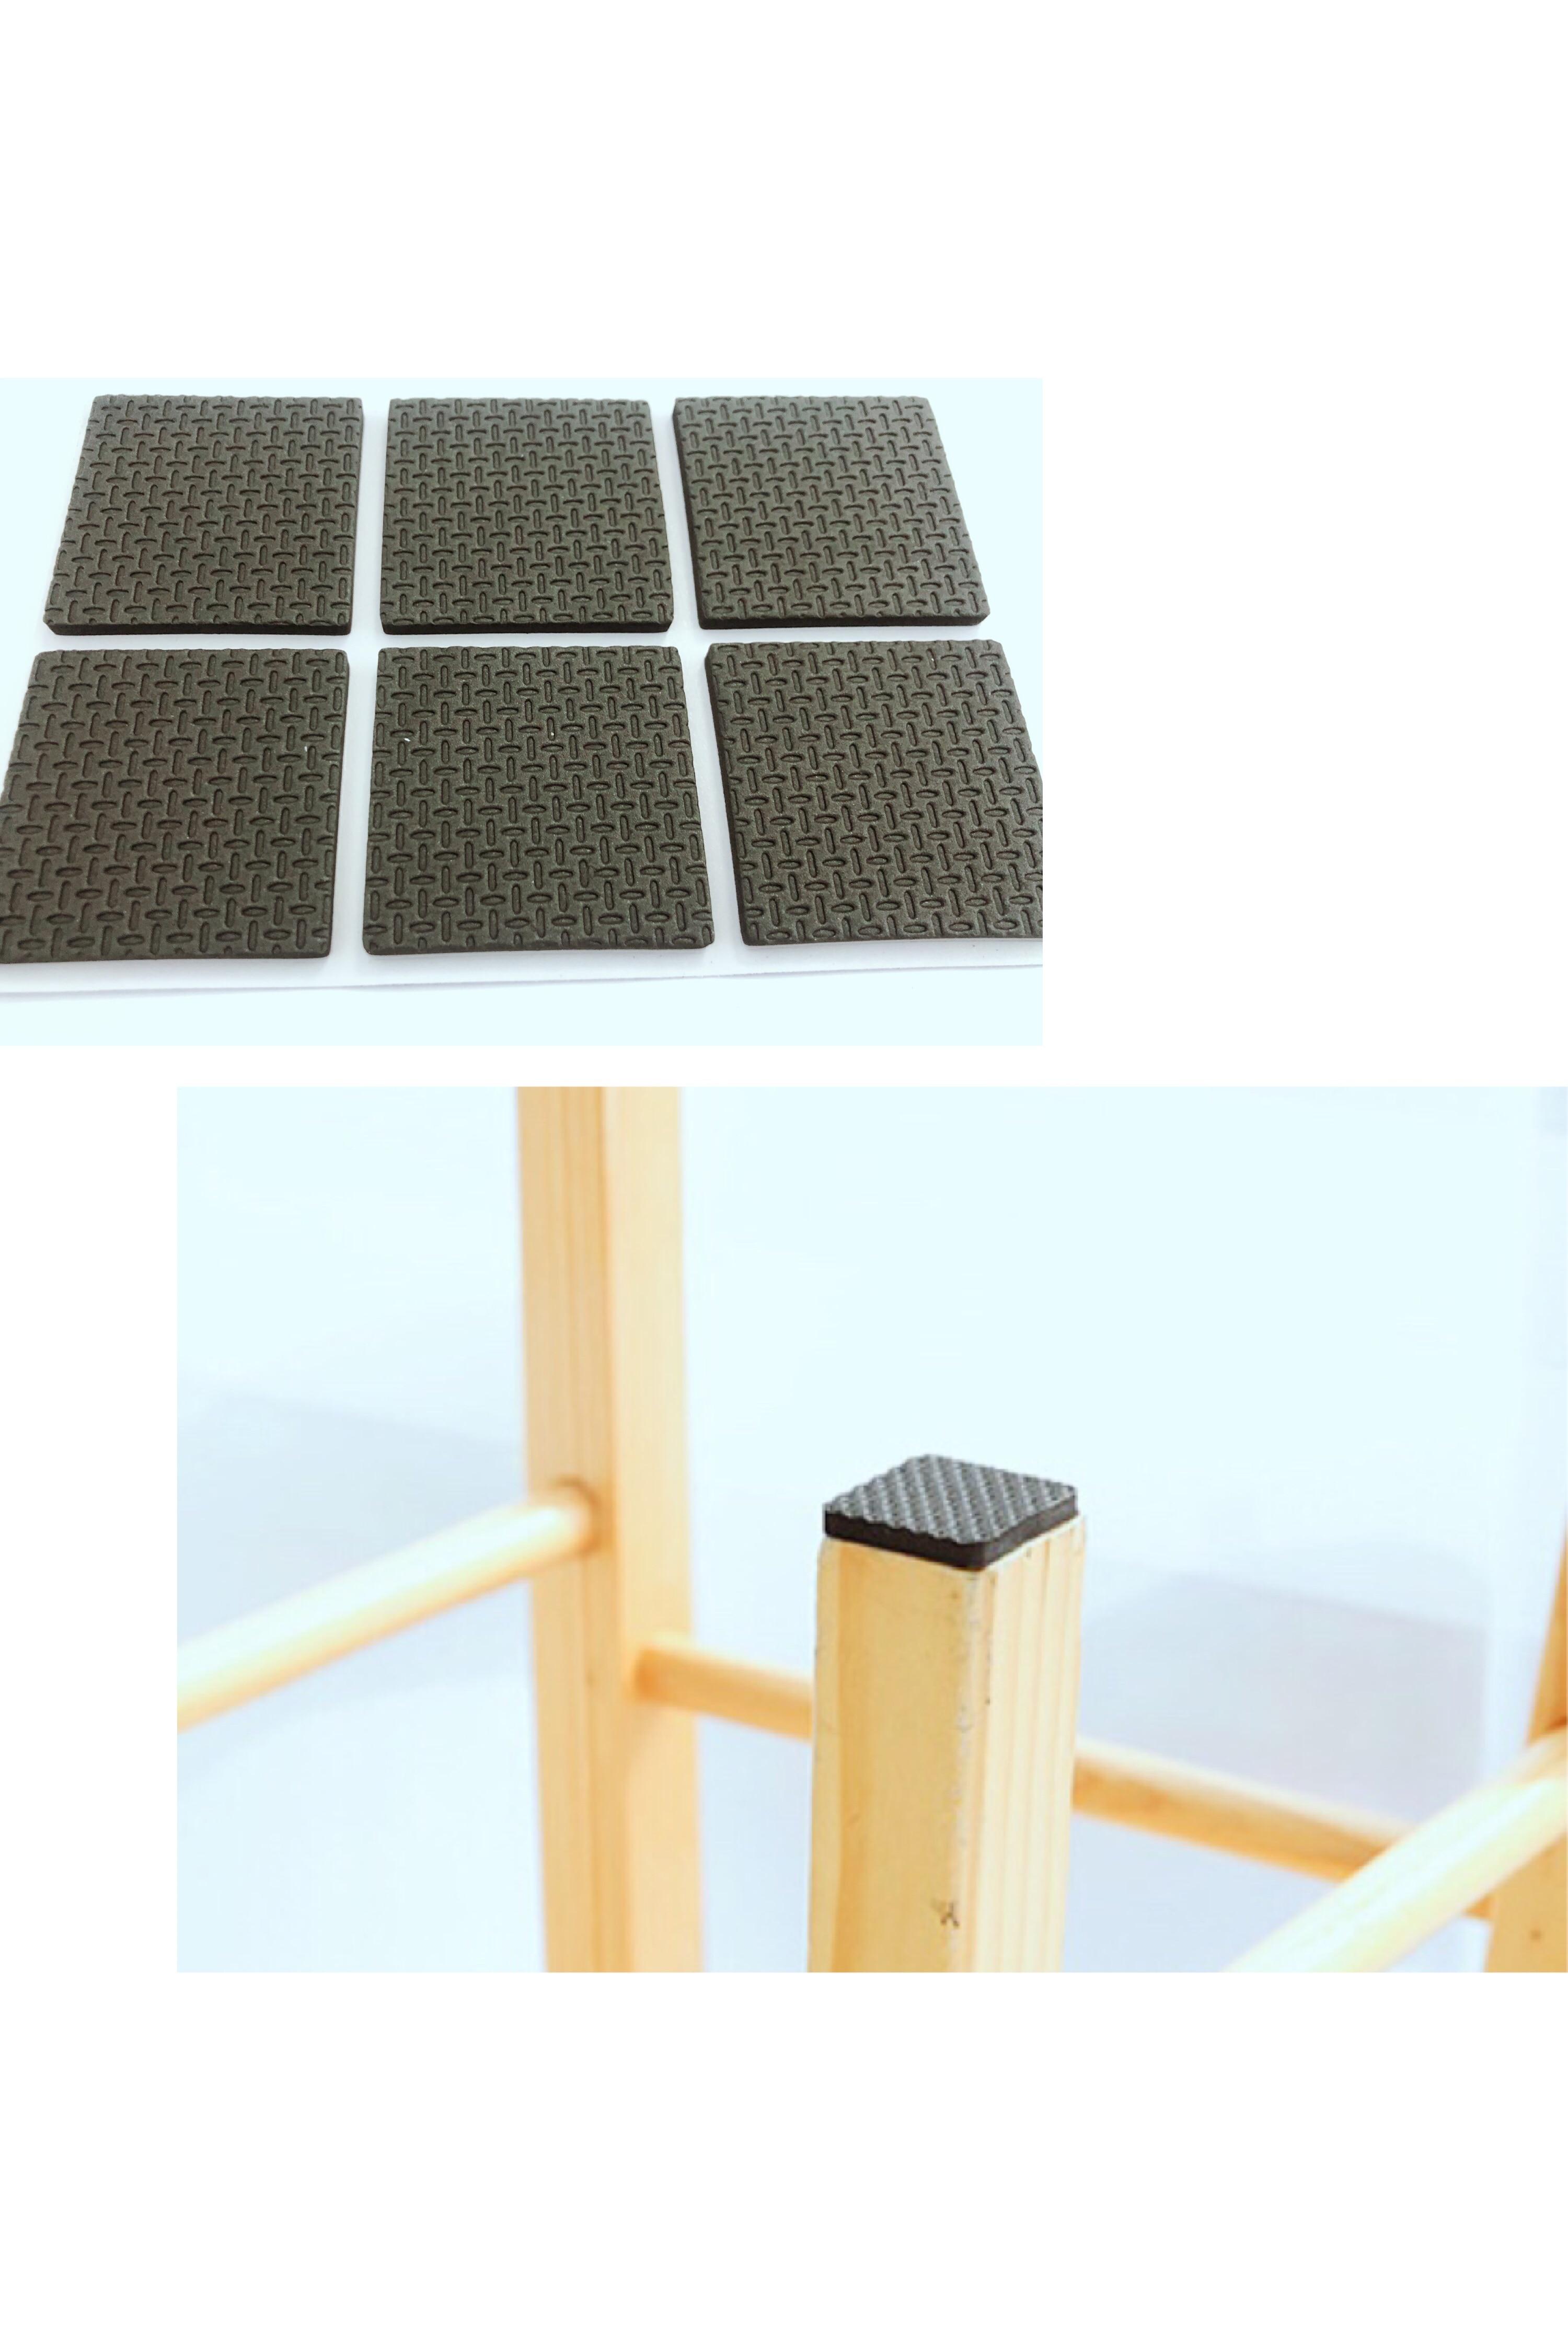 Geometric Self Adhesive Non-slip Mat Anti Slip Rubber  Desk Chair Furniture Pads